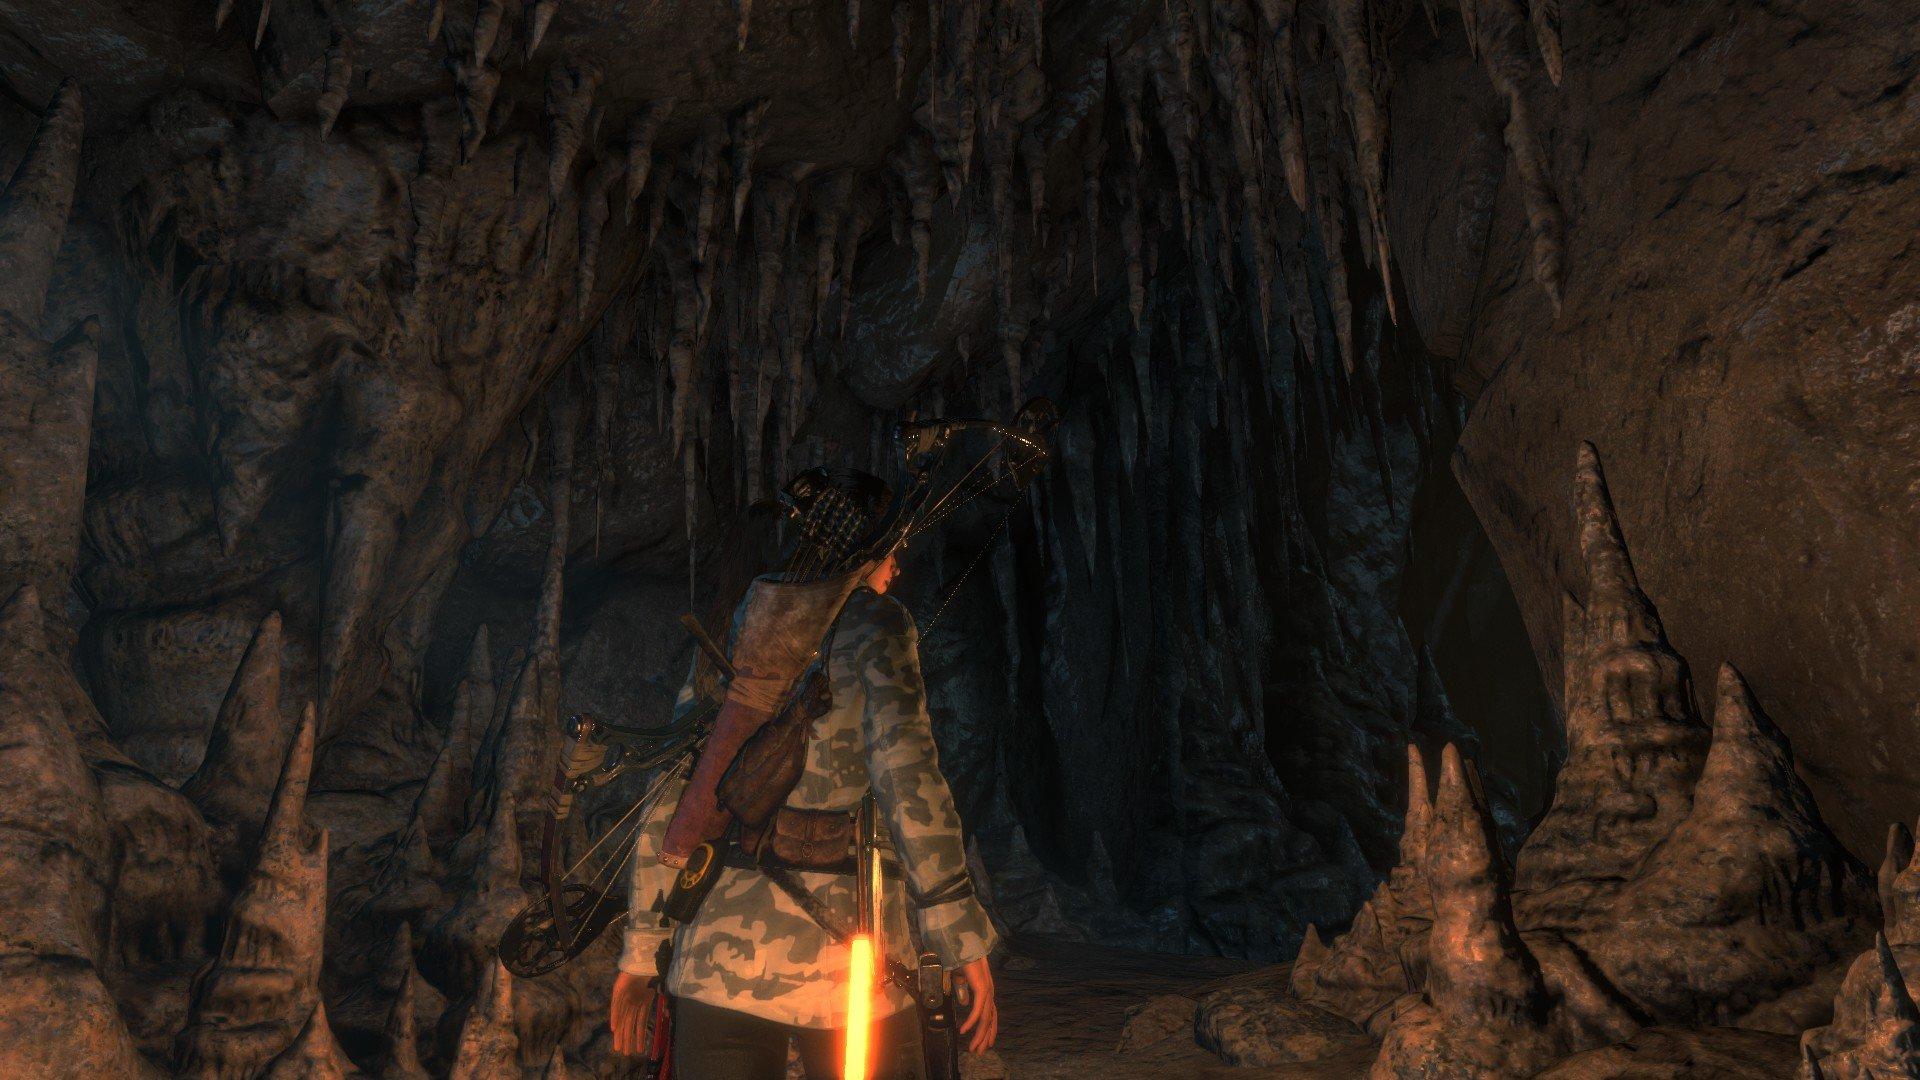 Rise of the Tomb Raider или да когда же этот медведь сдохнет?. - Изображение 11